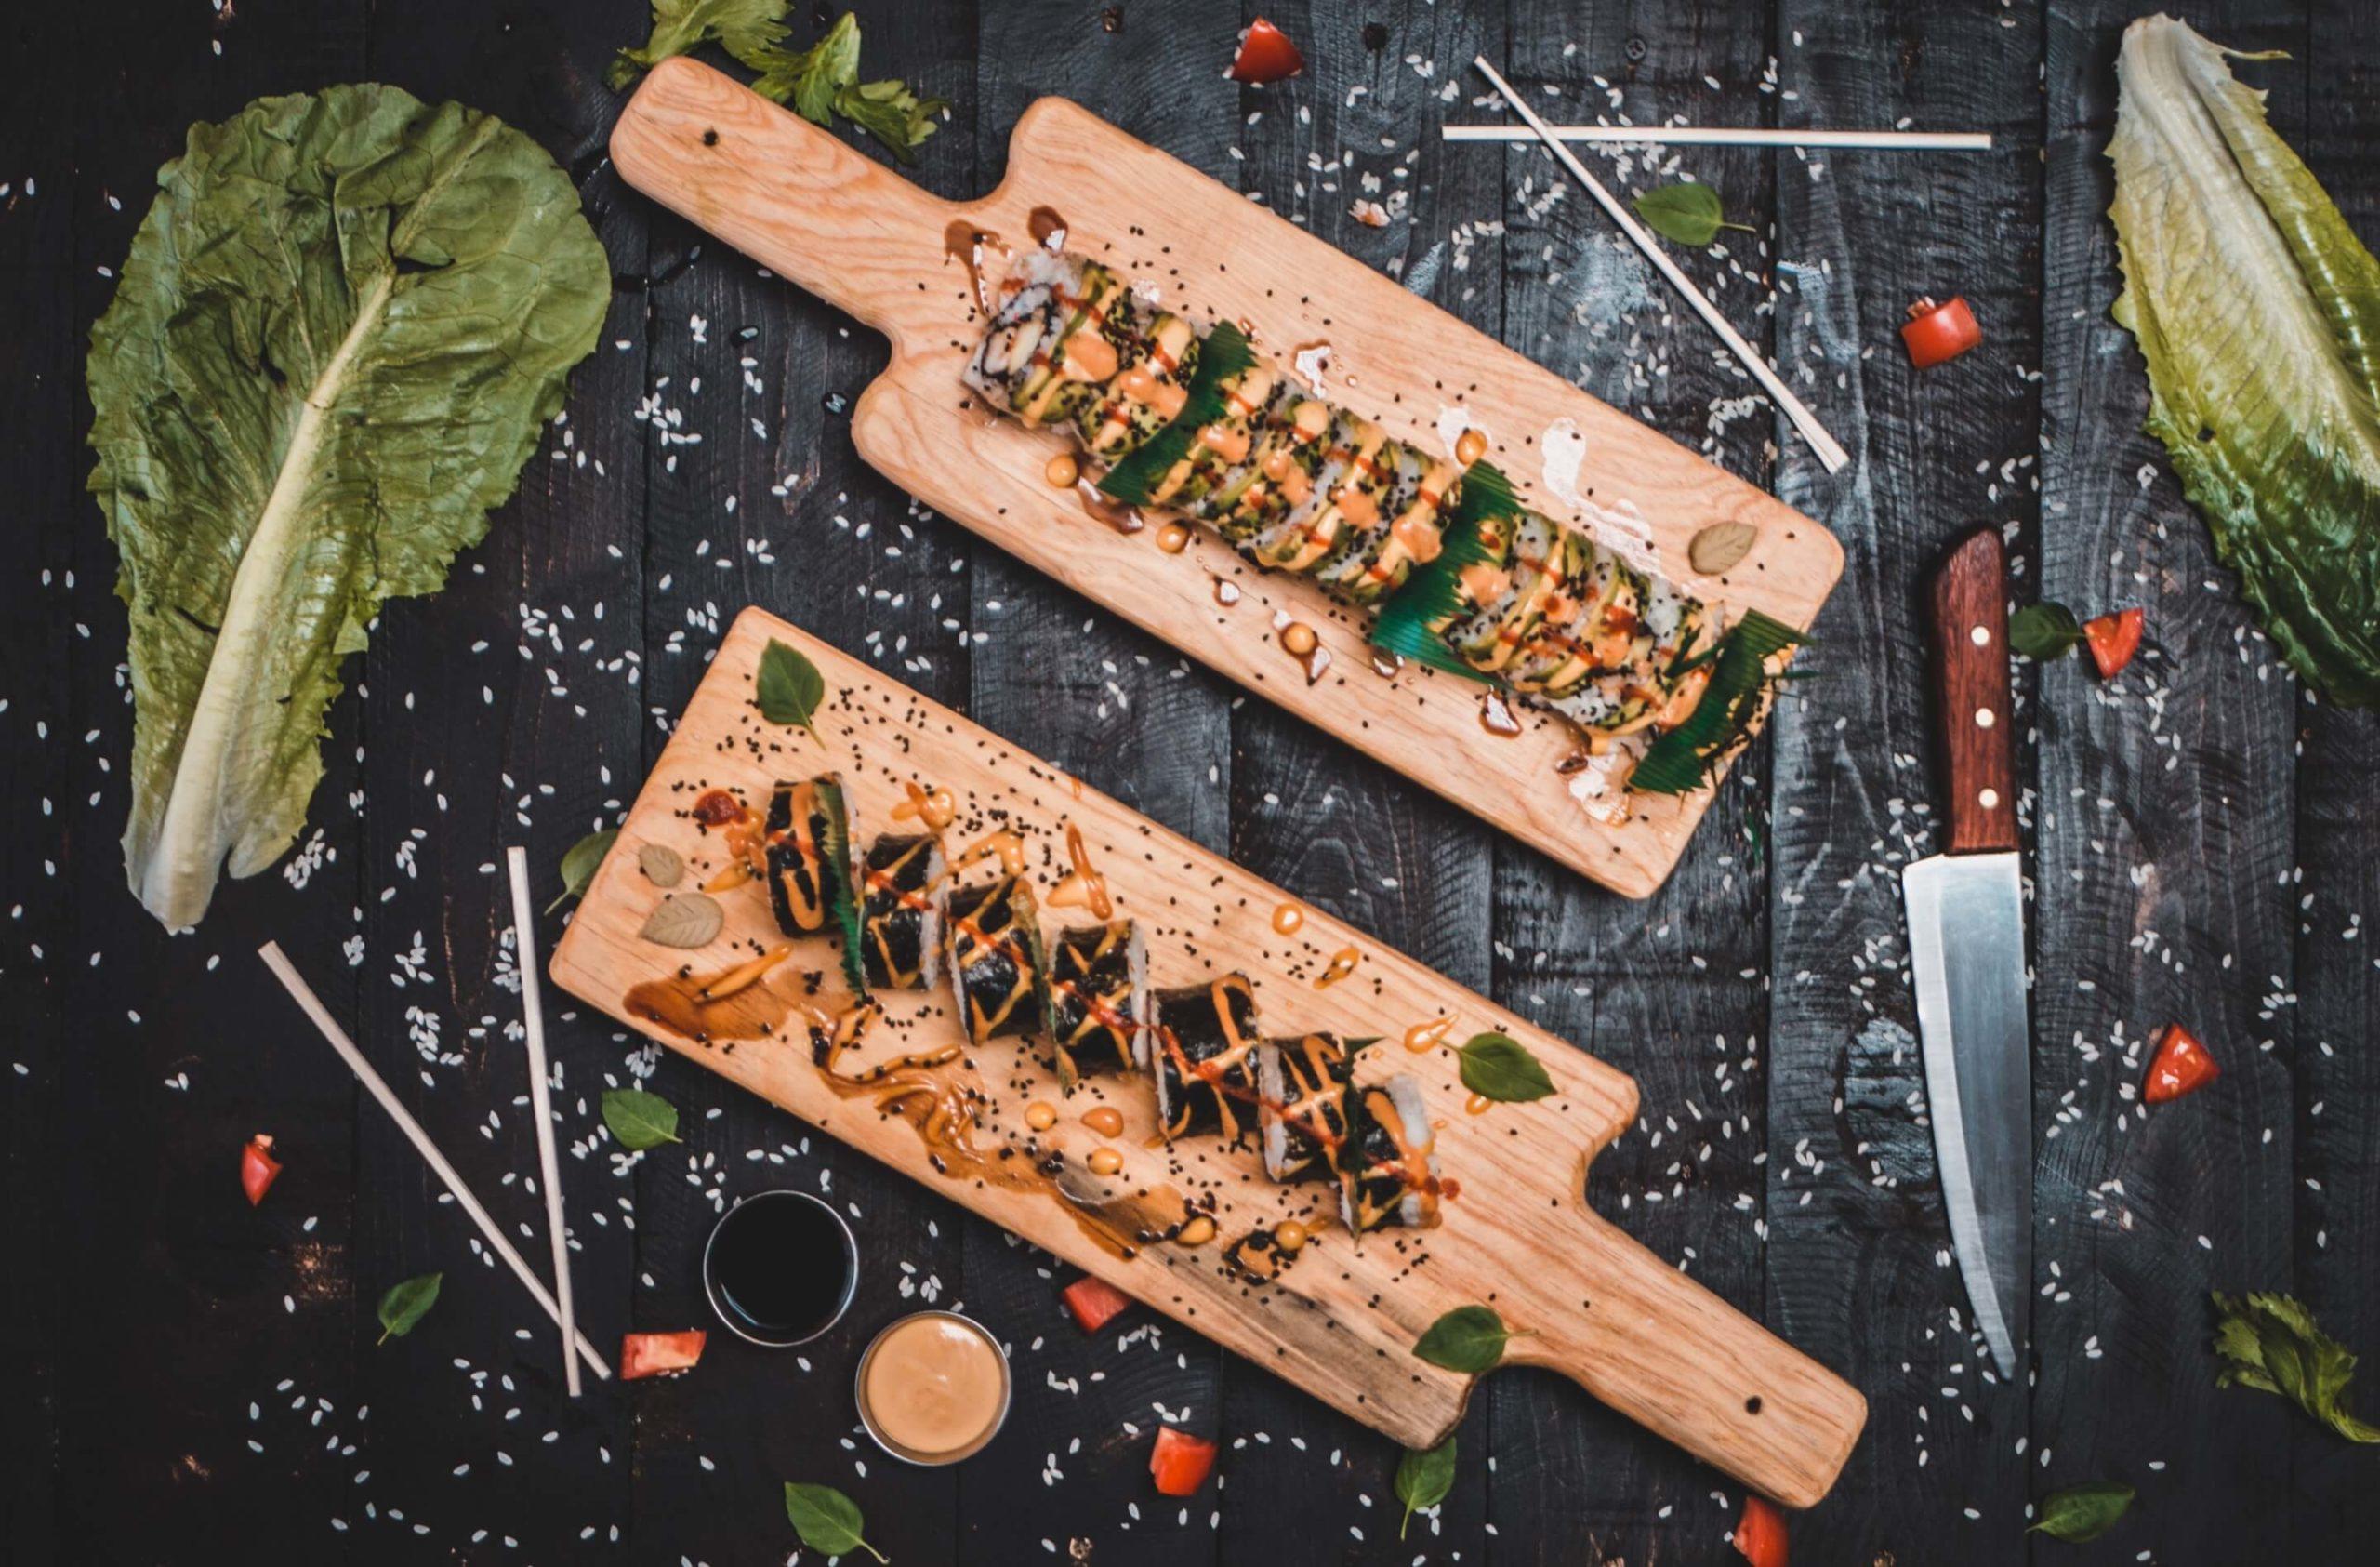 Food Corner: Top Japanese Restaurants for Sushi